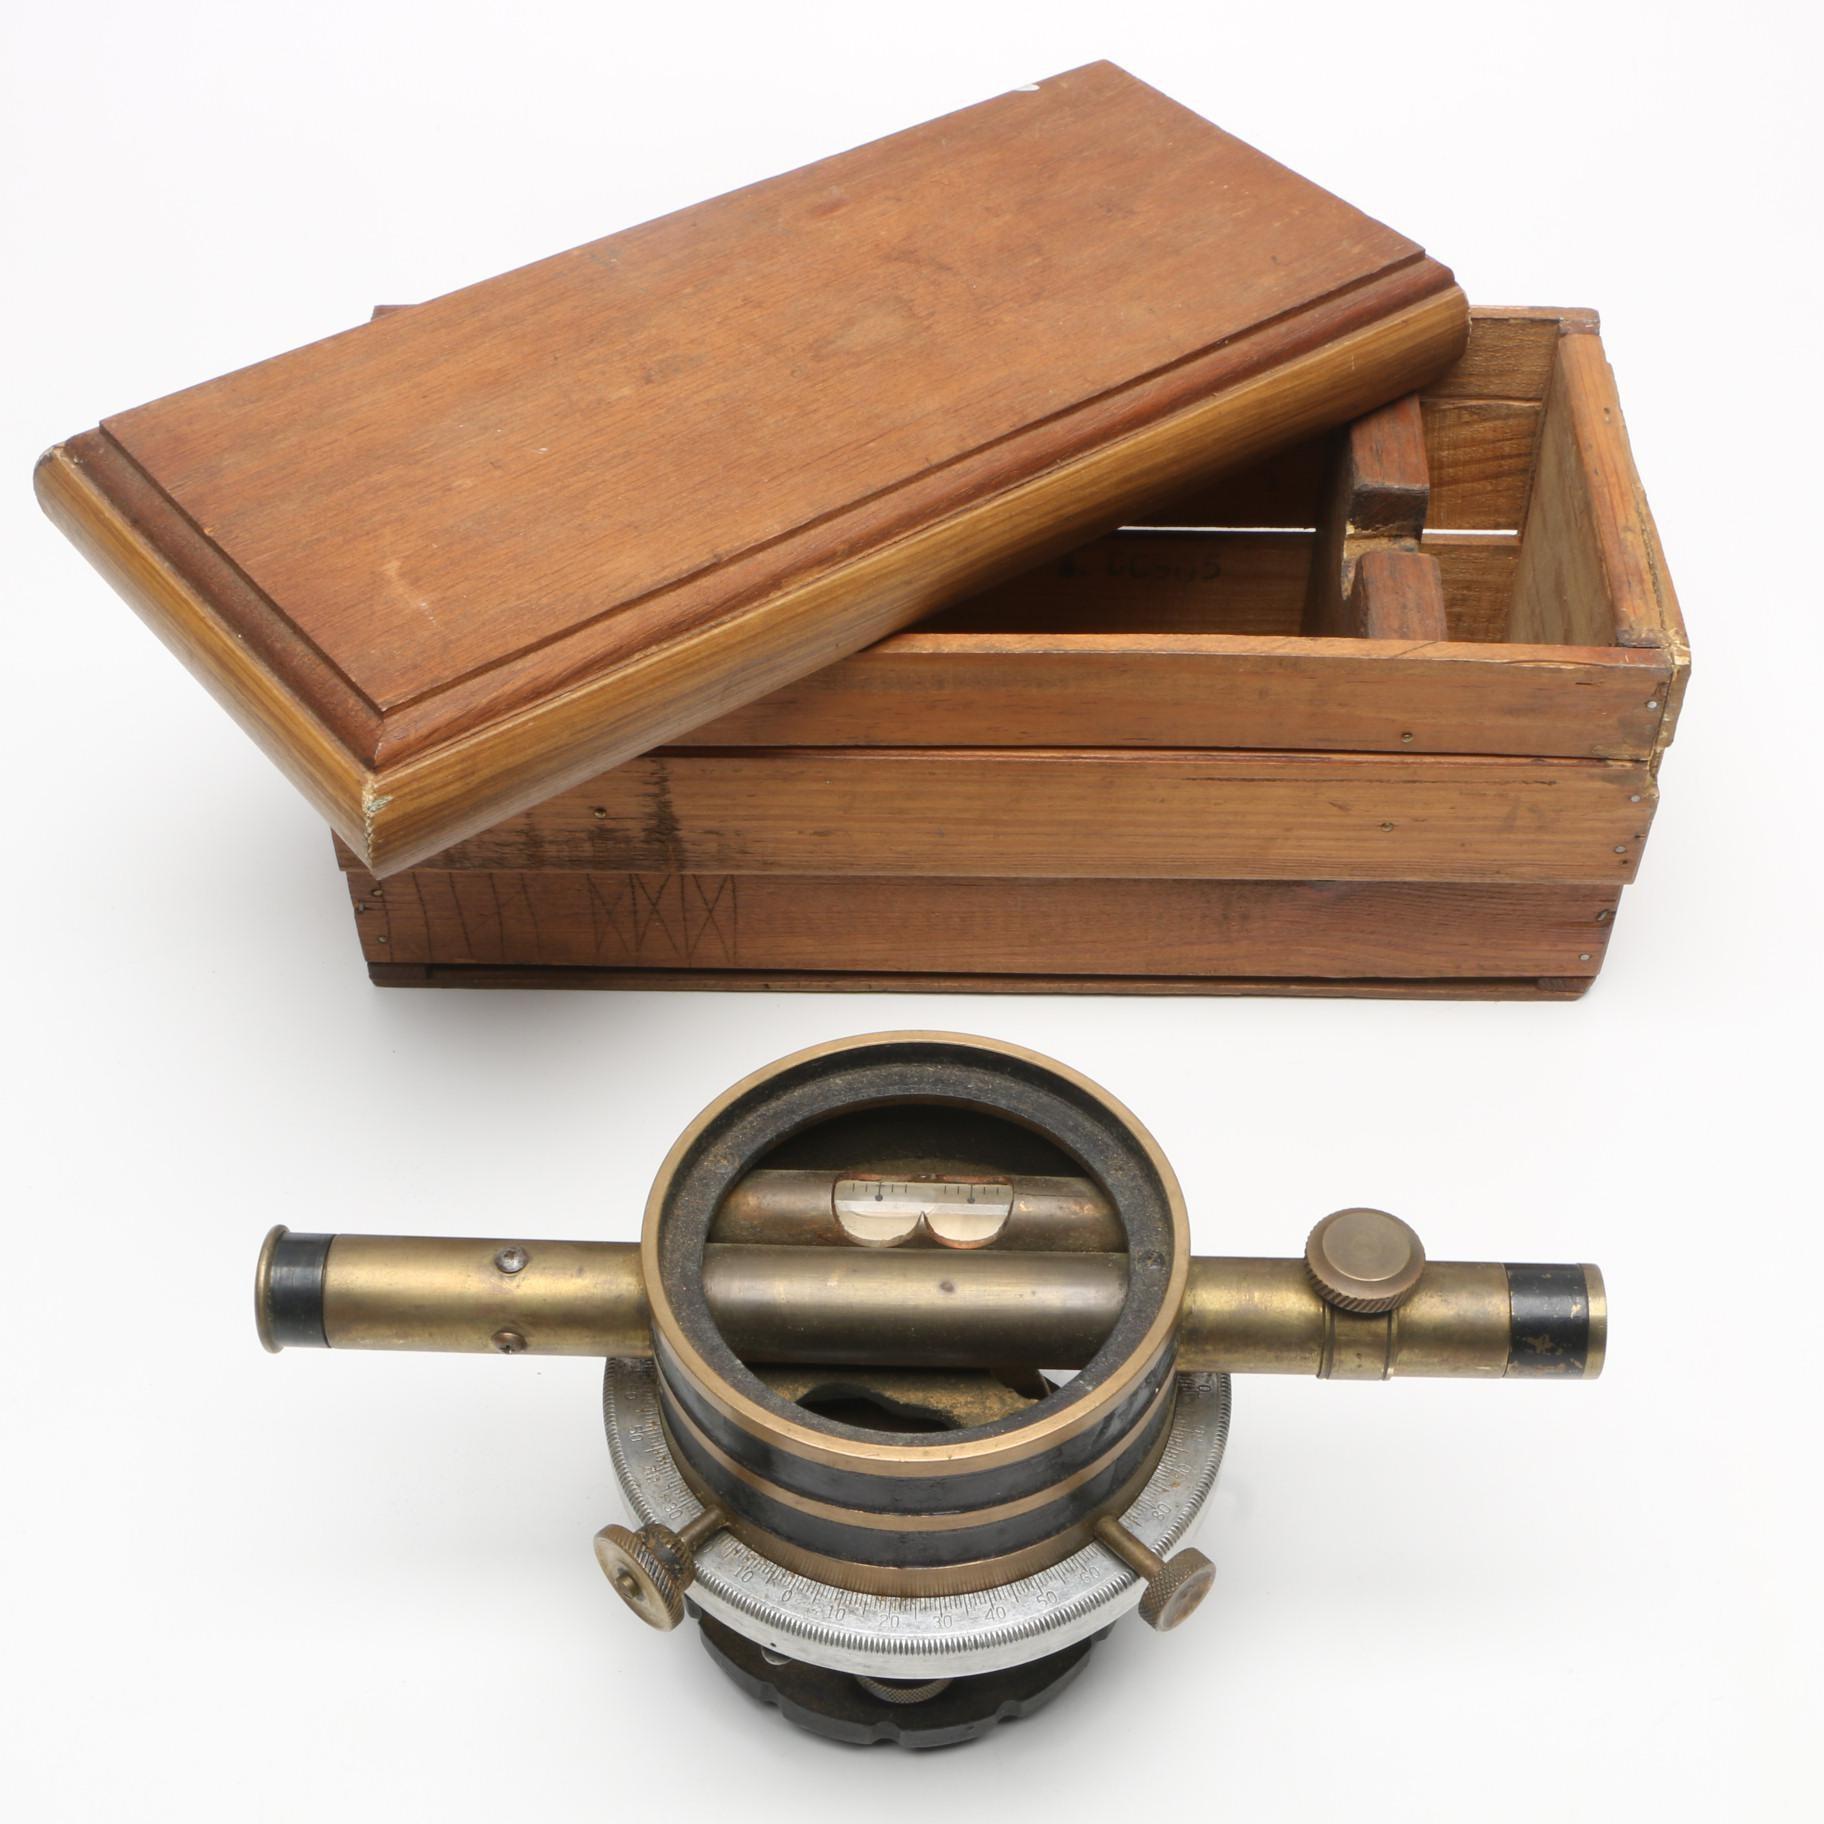 Vintage Bostrom-Brady Surveyor's Level Transit with Case